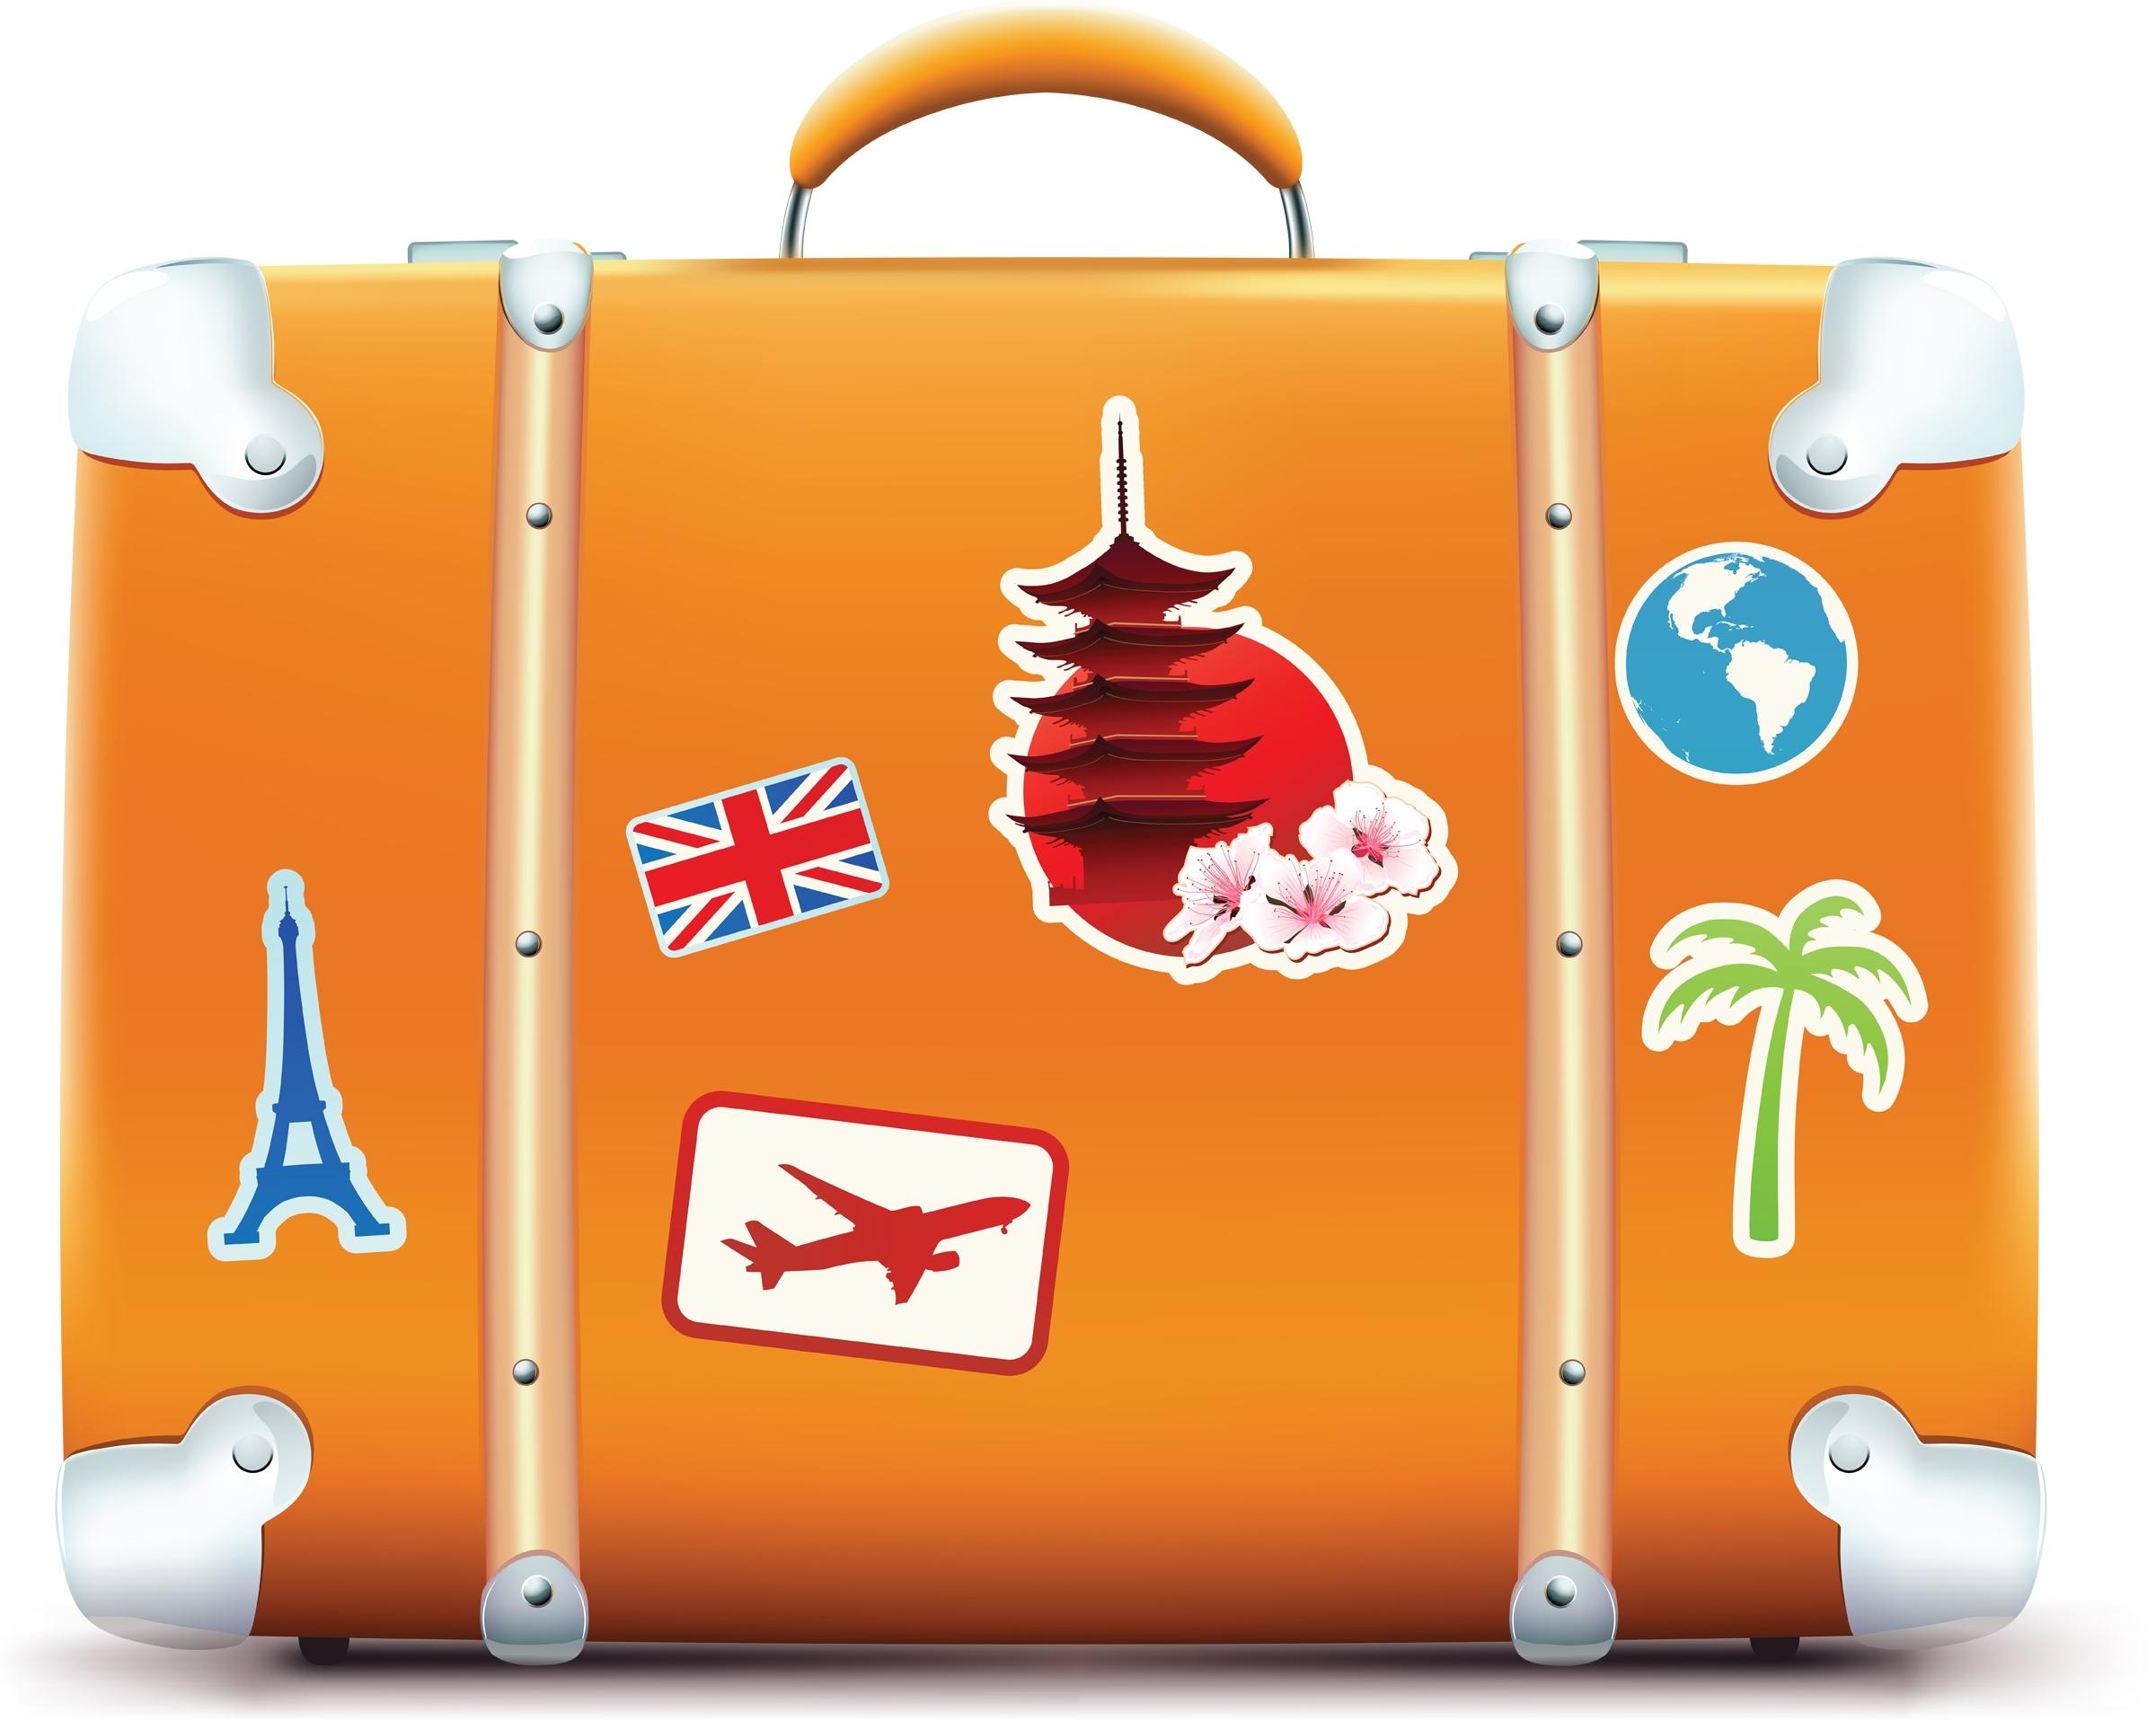 Luggage Clipart - 18 - L - Luggage Clipa-luggage clipart - 18 - l - Luggage clipart Clipground-8